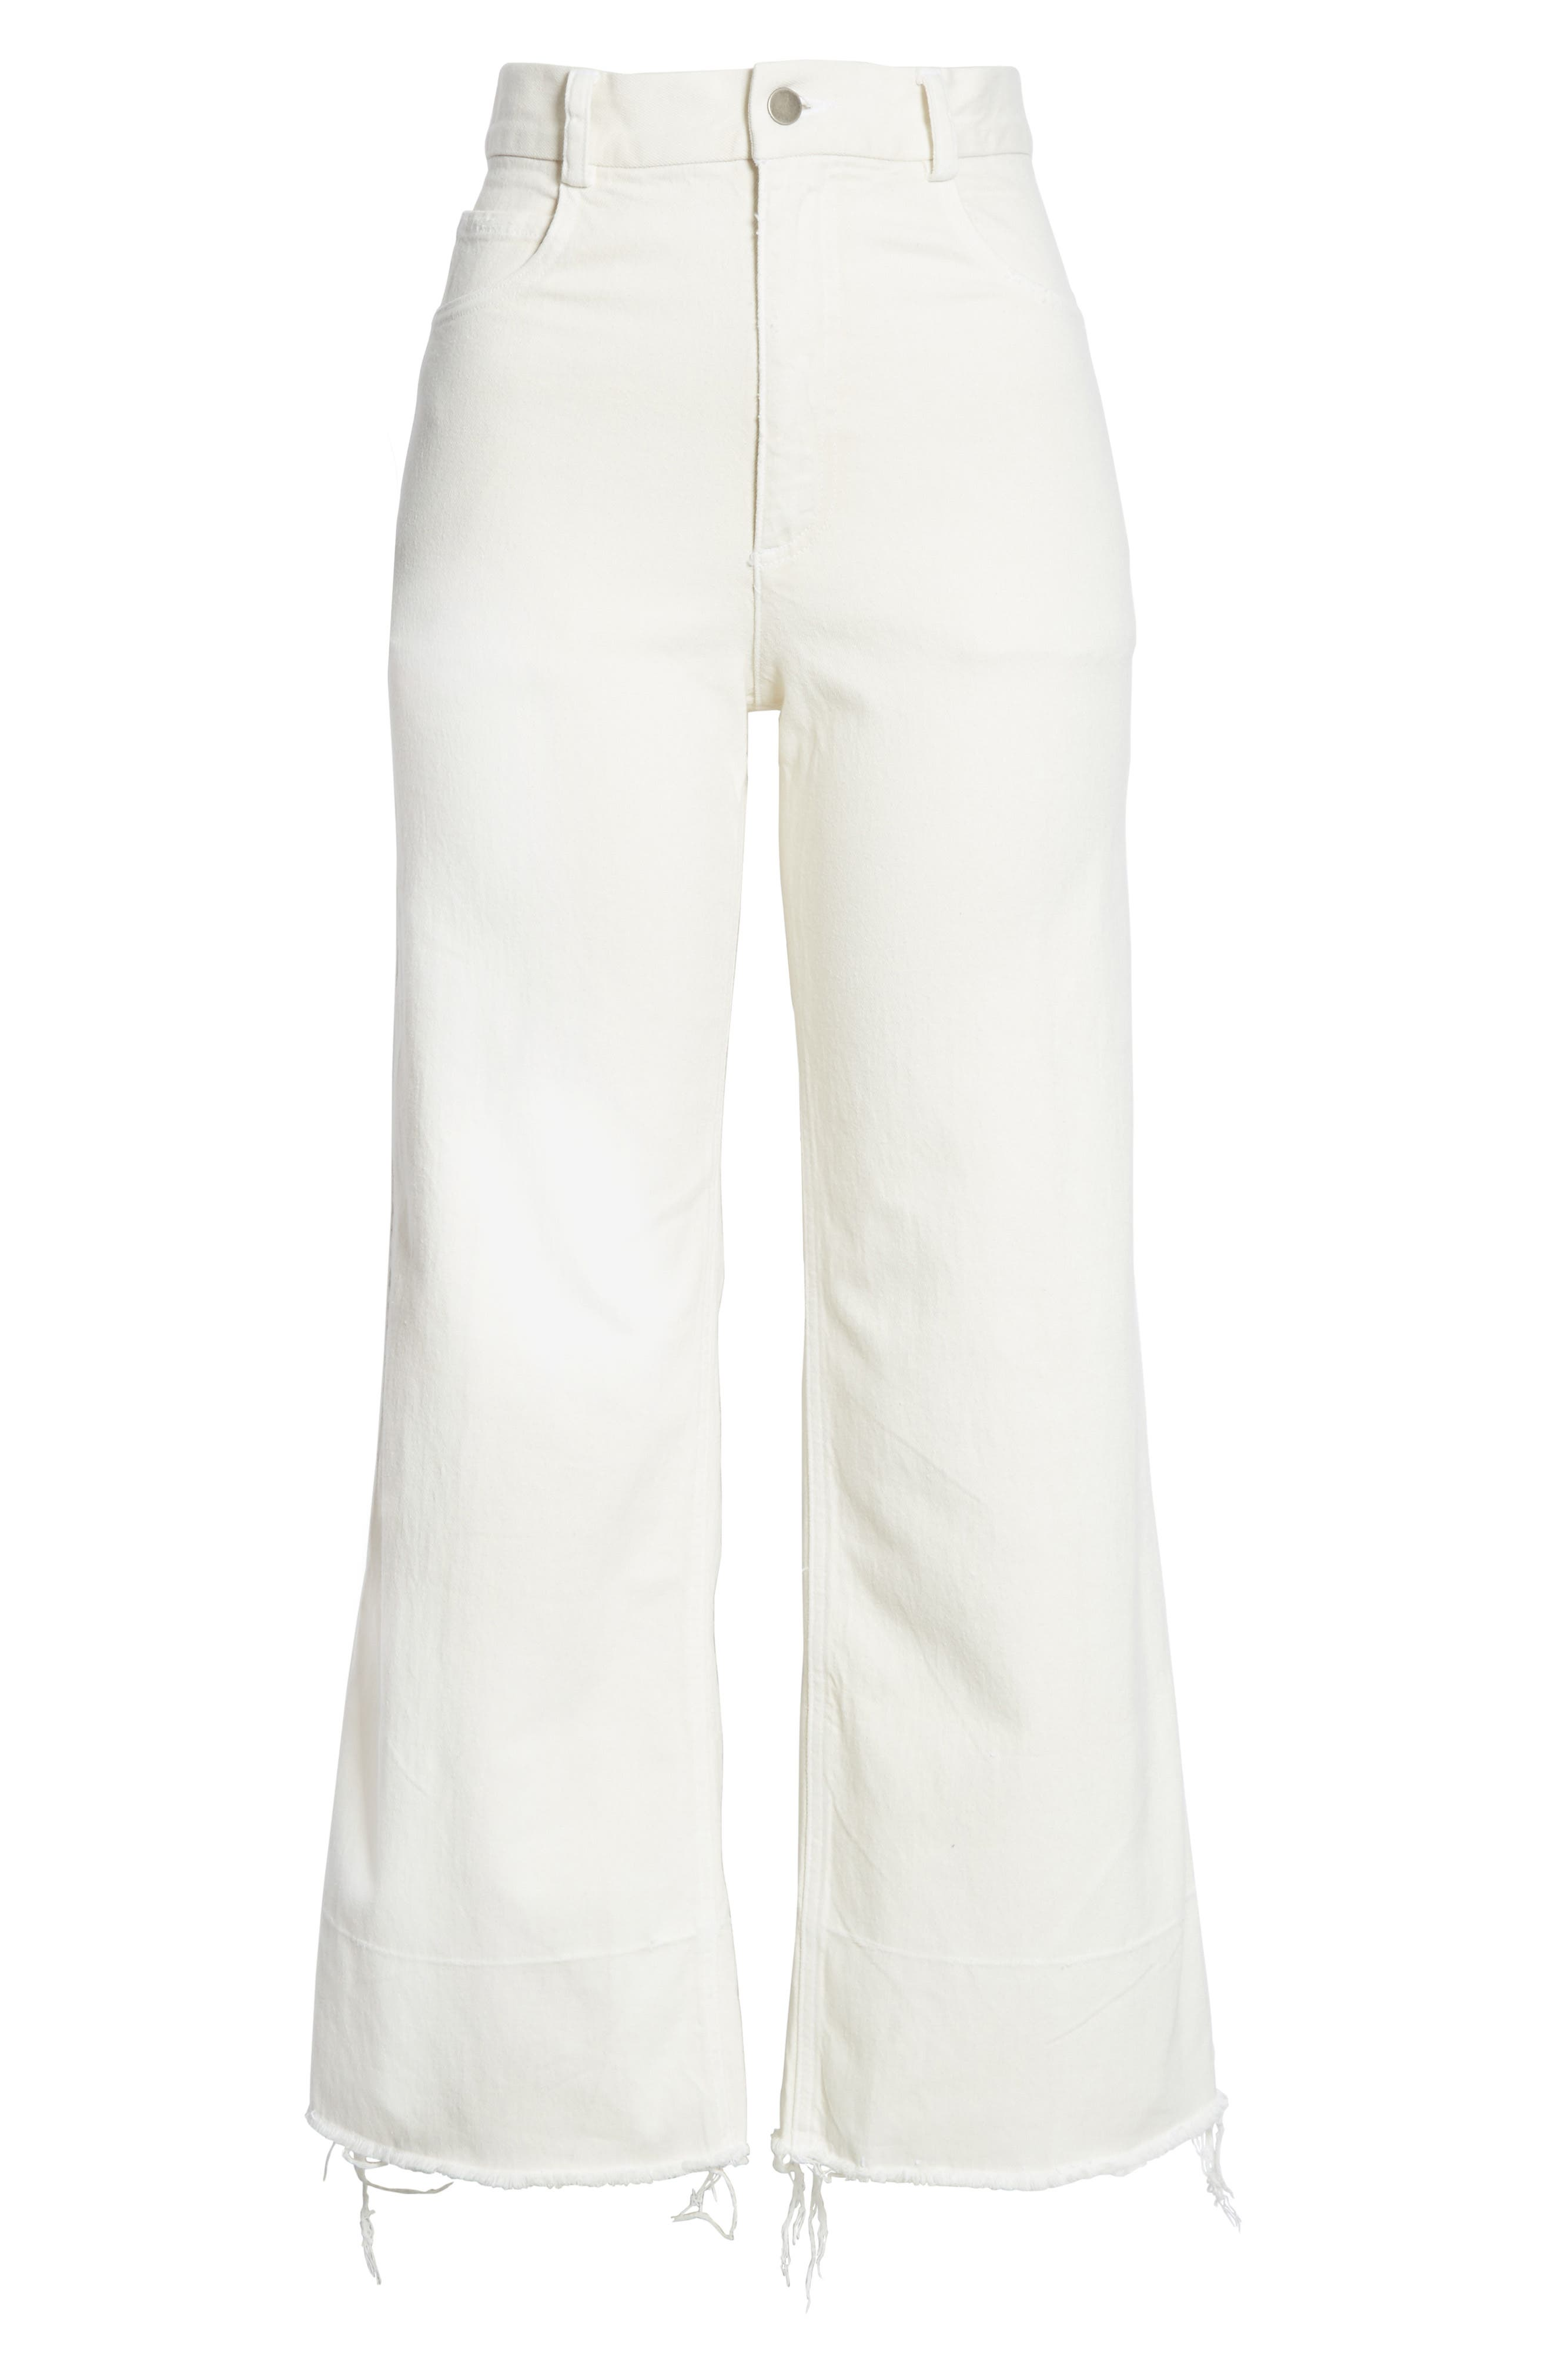 Rachey Comey Legion Crop Wide Leg Pants,                             Alternate thumbnail 6, color,                             DIRTY WHITE